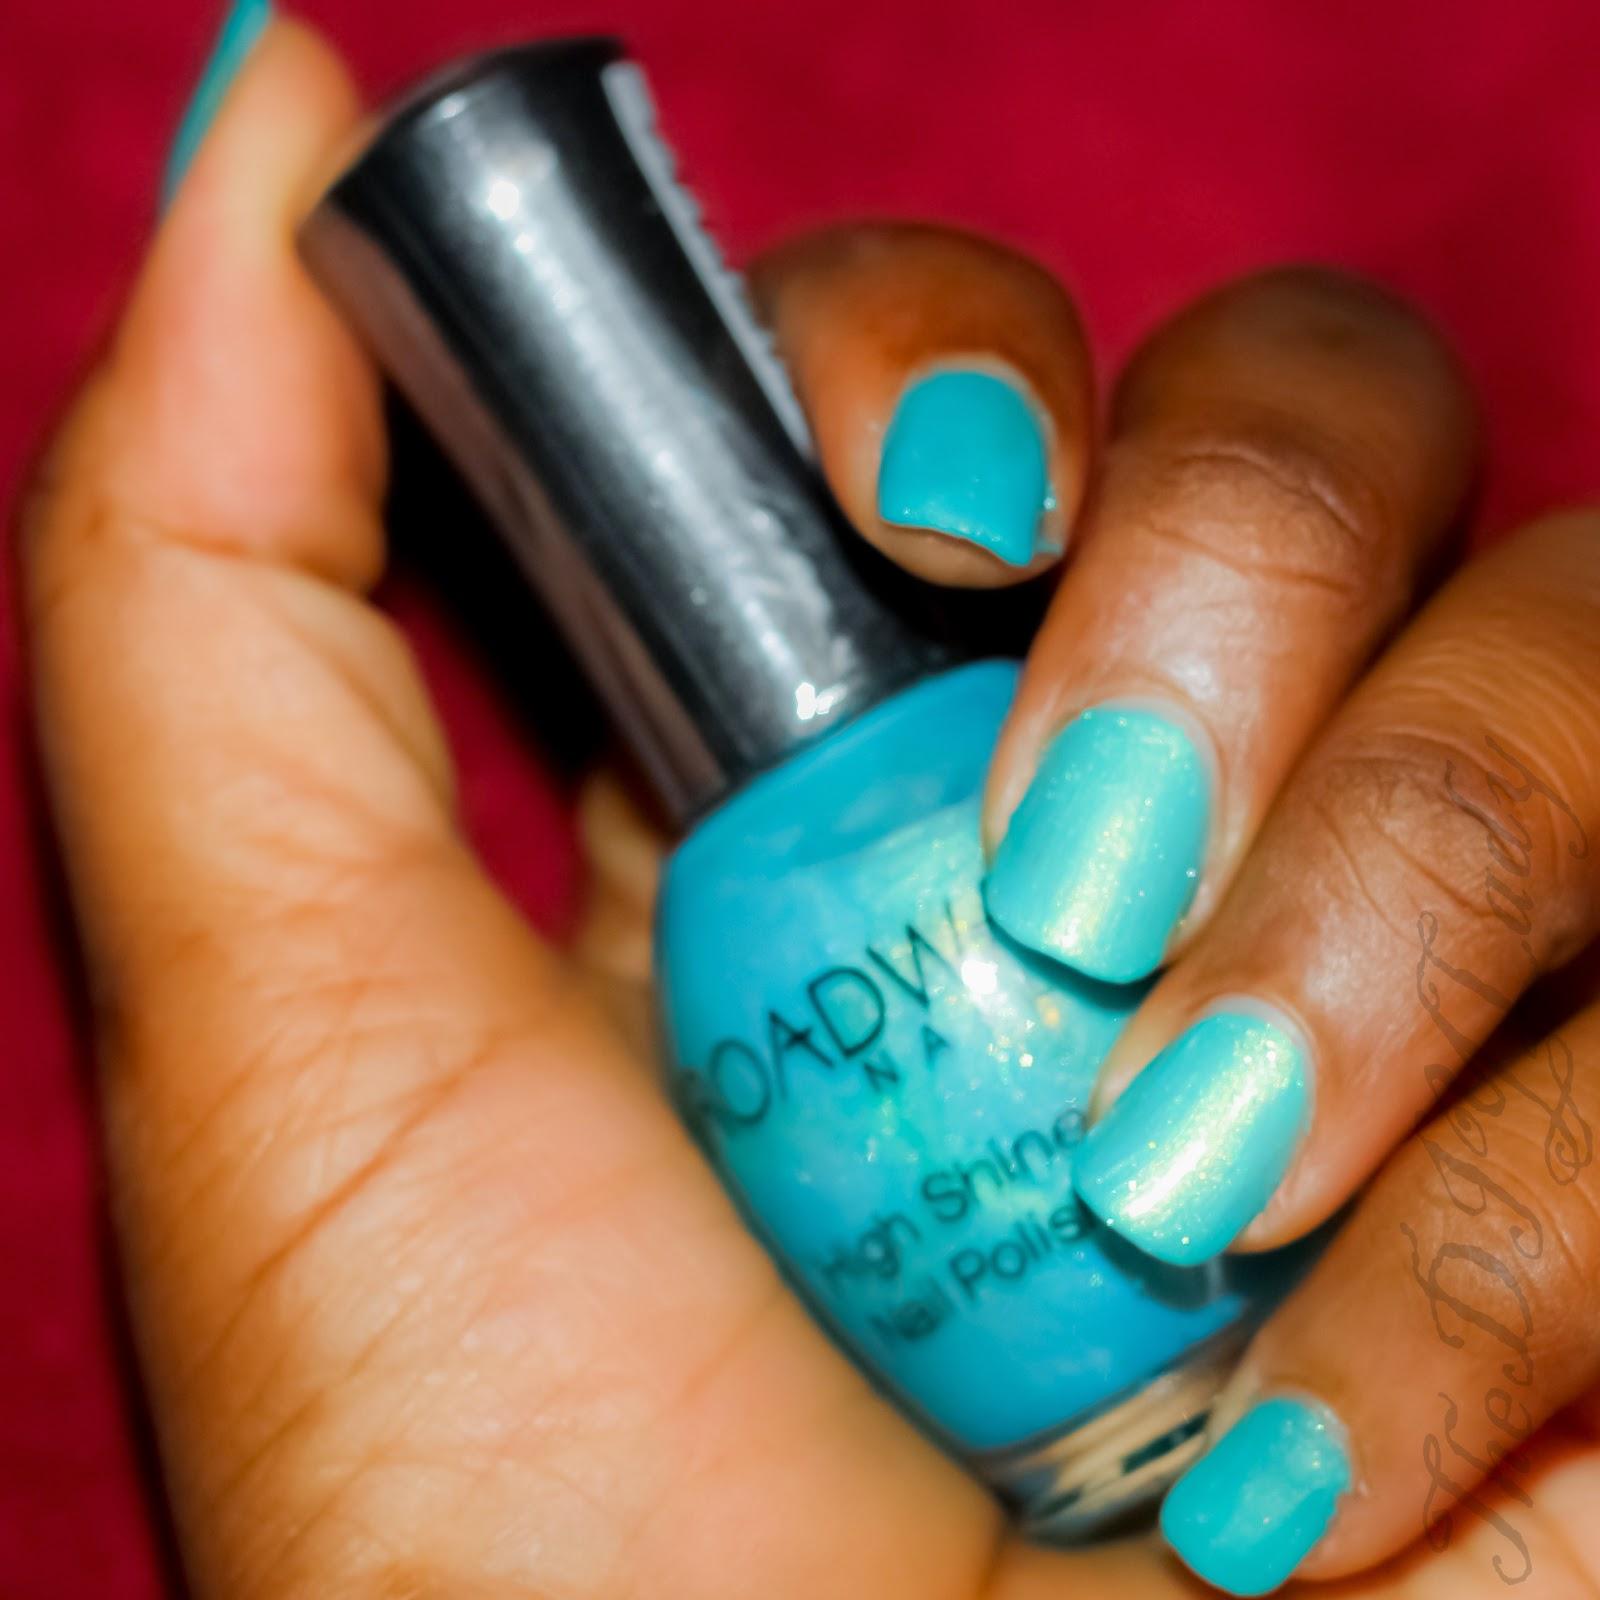 Swatches and Review: Broadway Nails High Shine Nail Polish ...